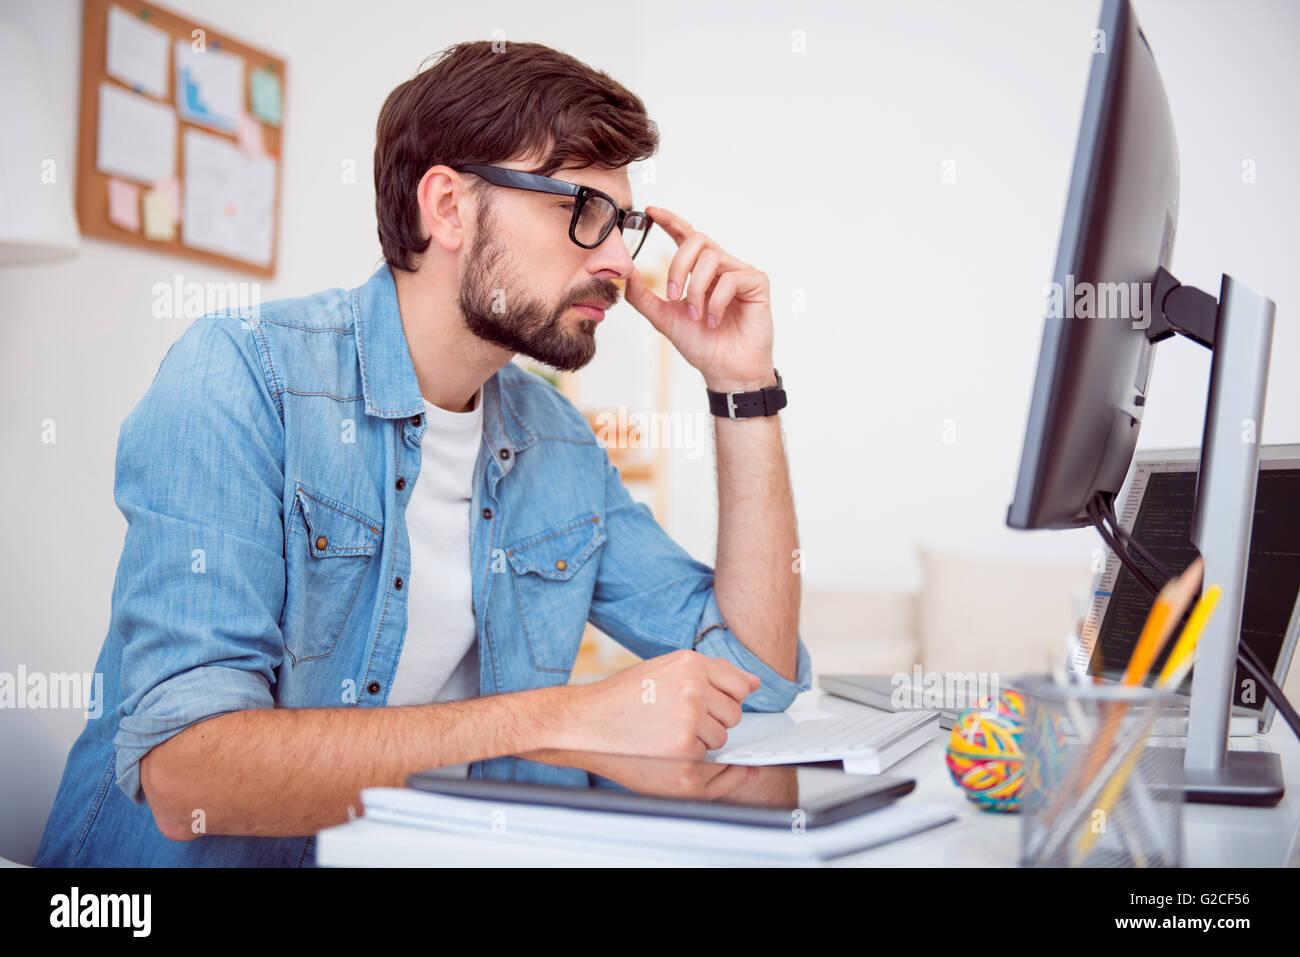 Man looking at screen of computer - Stock Image